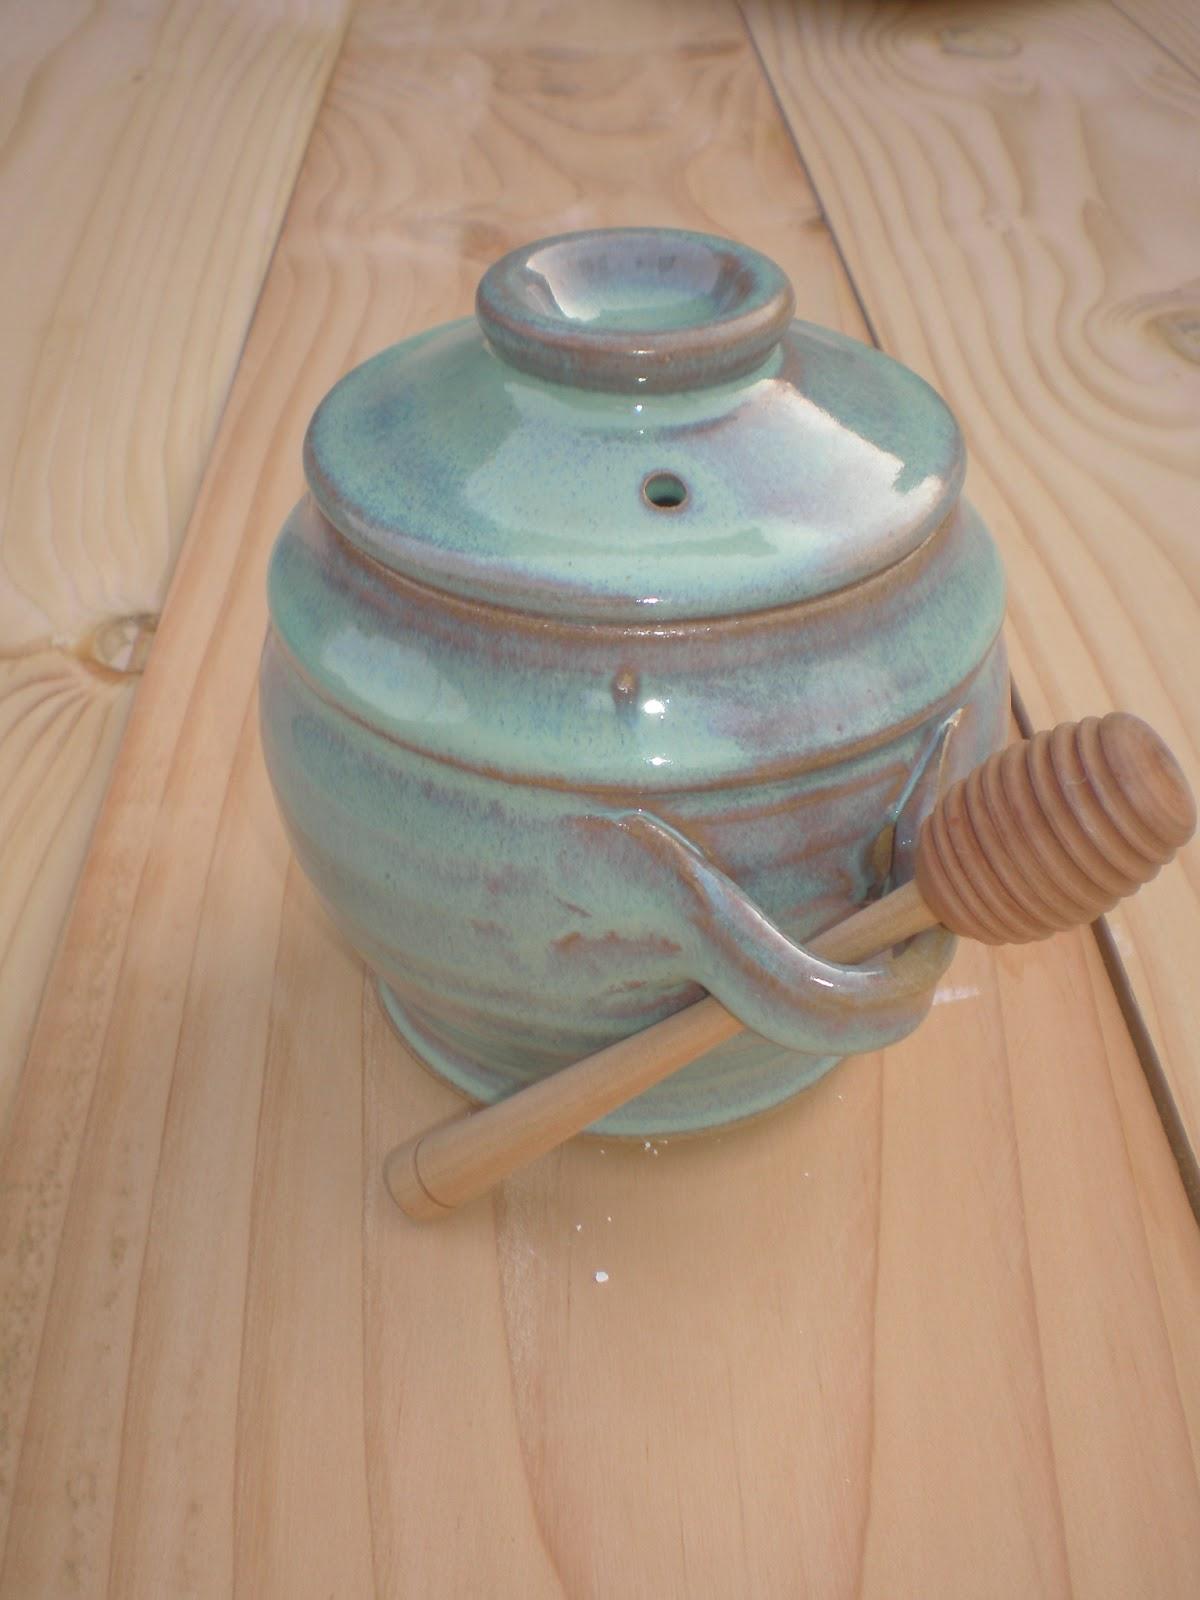 Cer mica colcol taller u oa santiago chile for Oxidos para ceramica